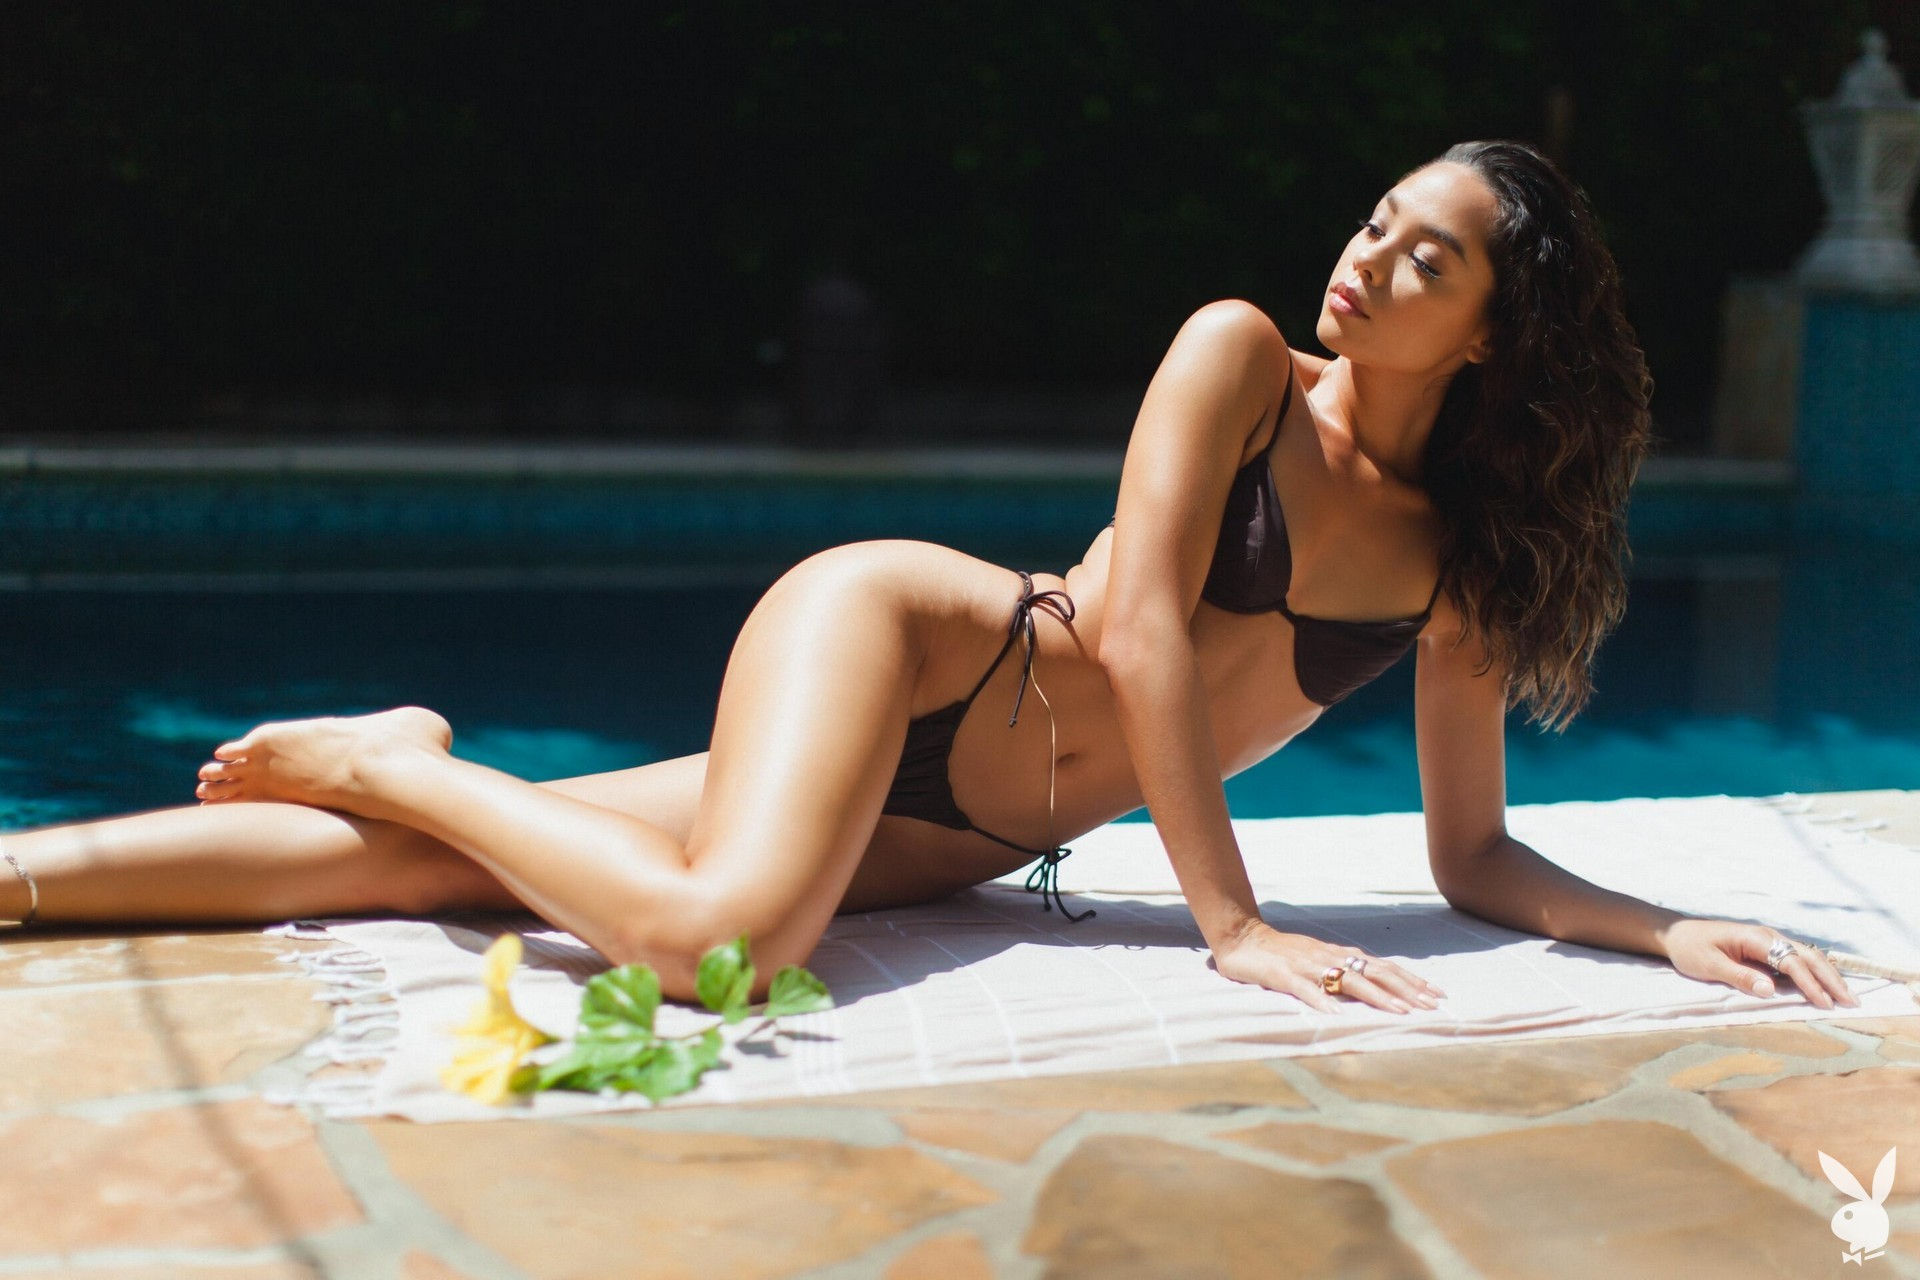 Danielle Alcaraz Playmate Outtakes Playboy Plus (2)